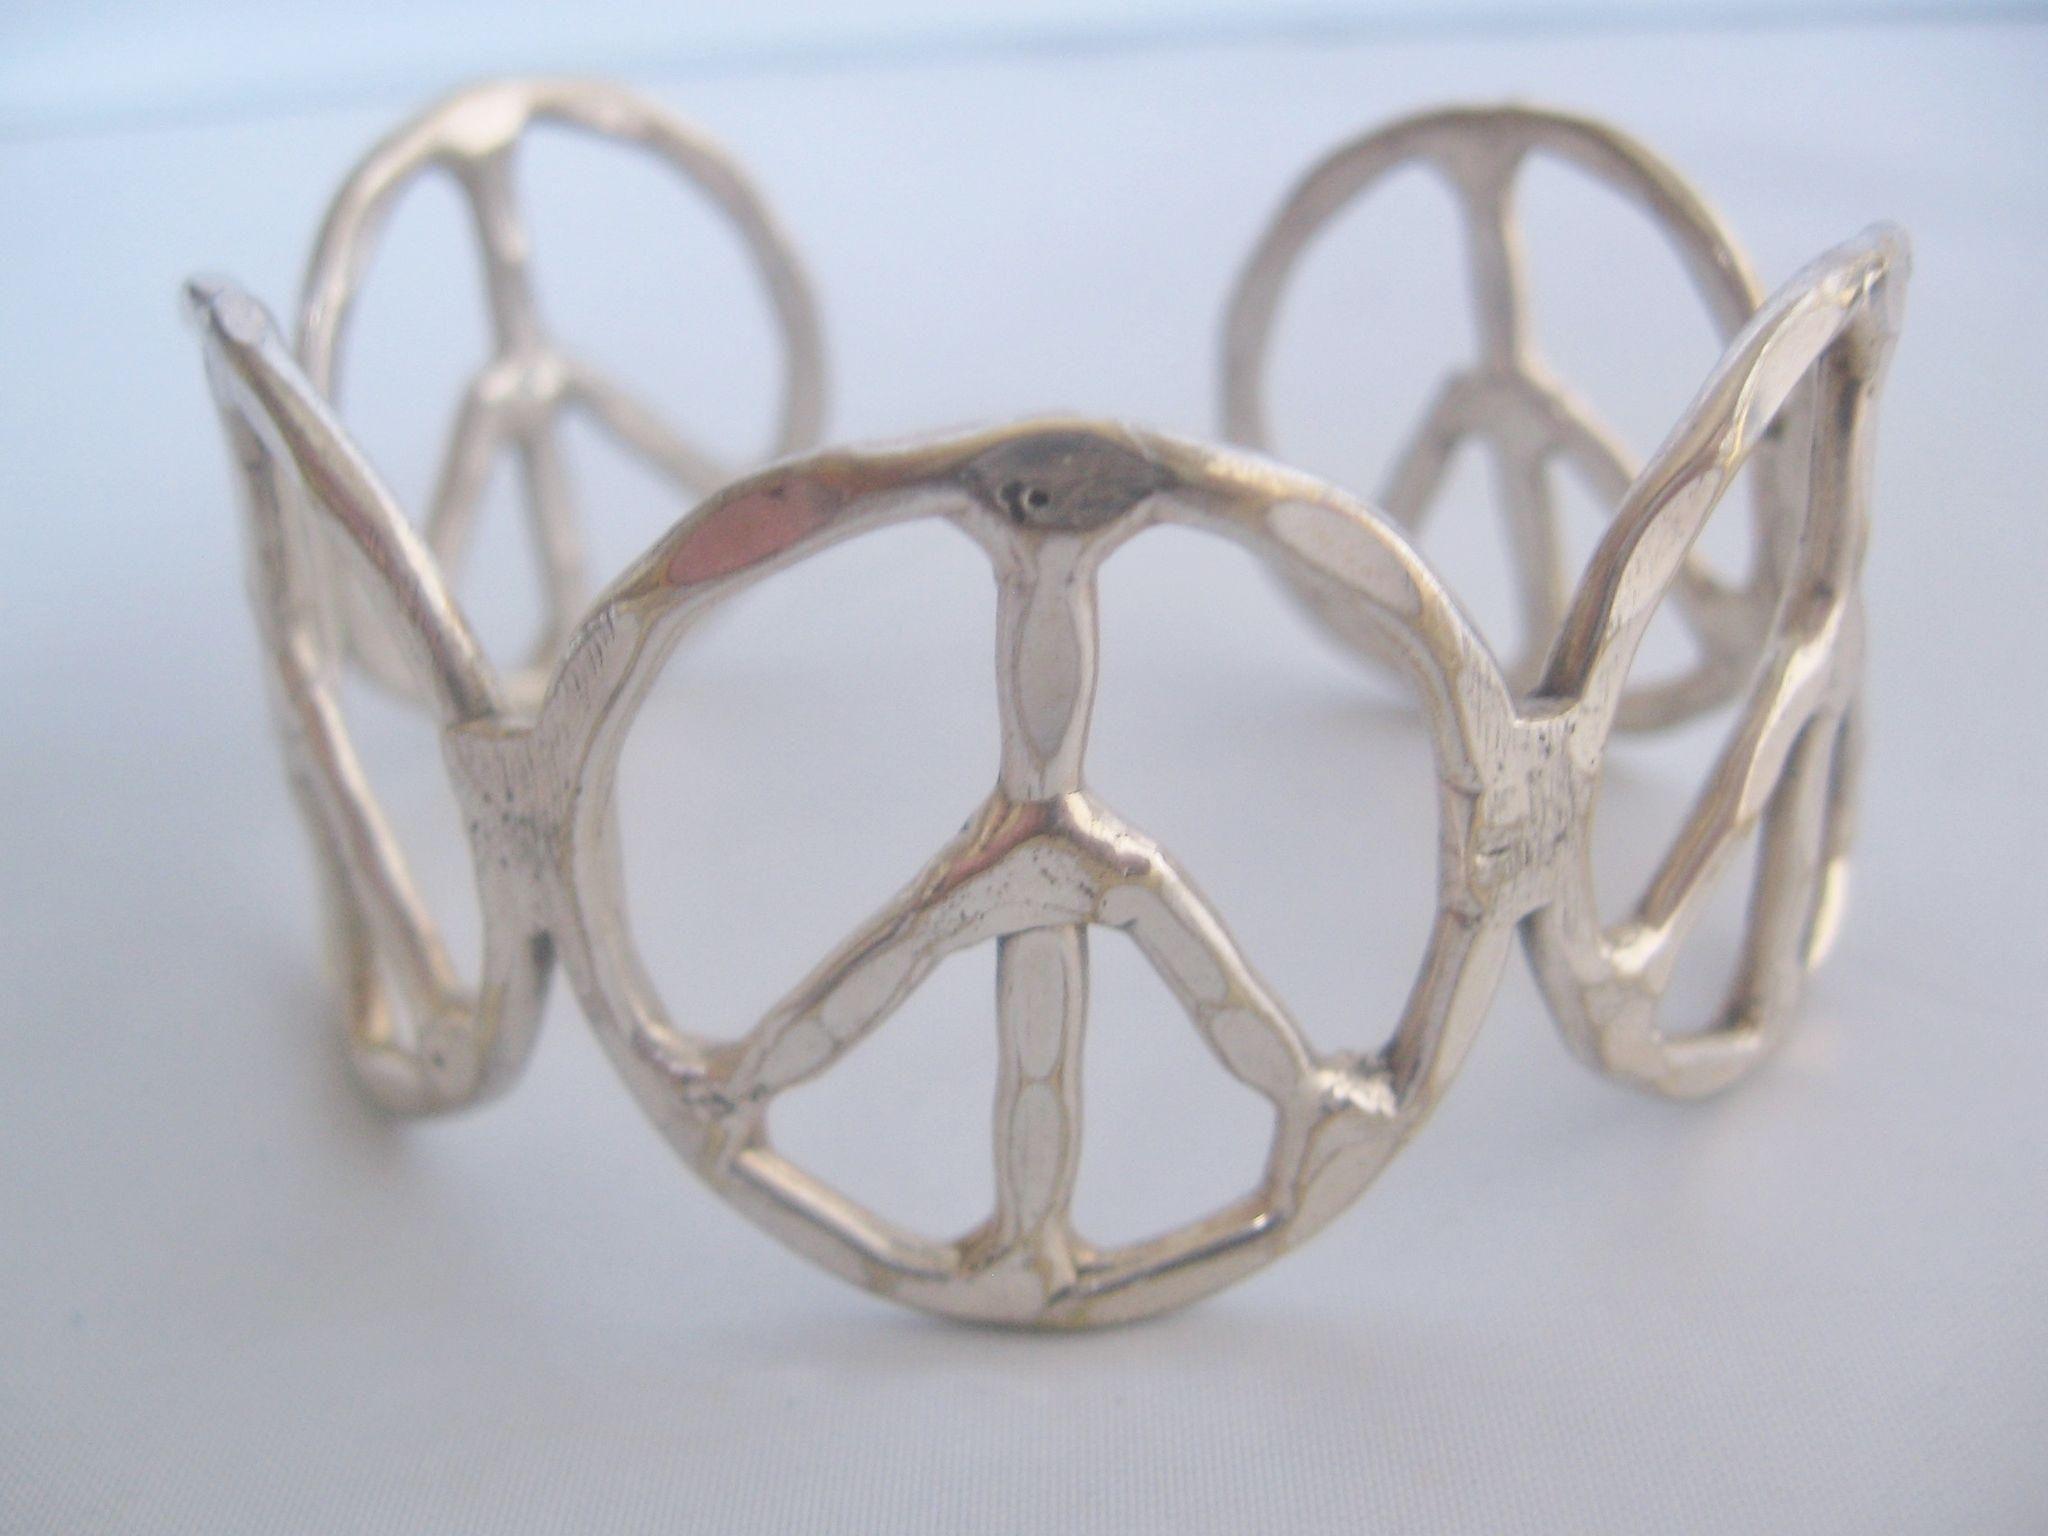 Vintage Silver tone Hammered Handmade Peace Cuff Bracelet